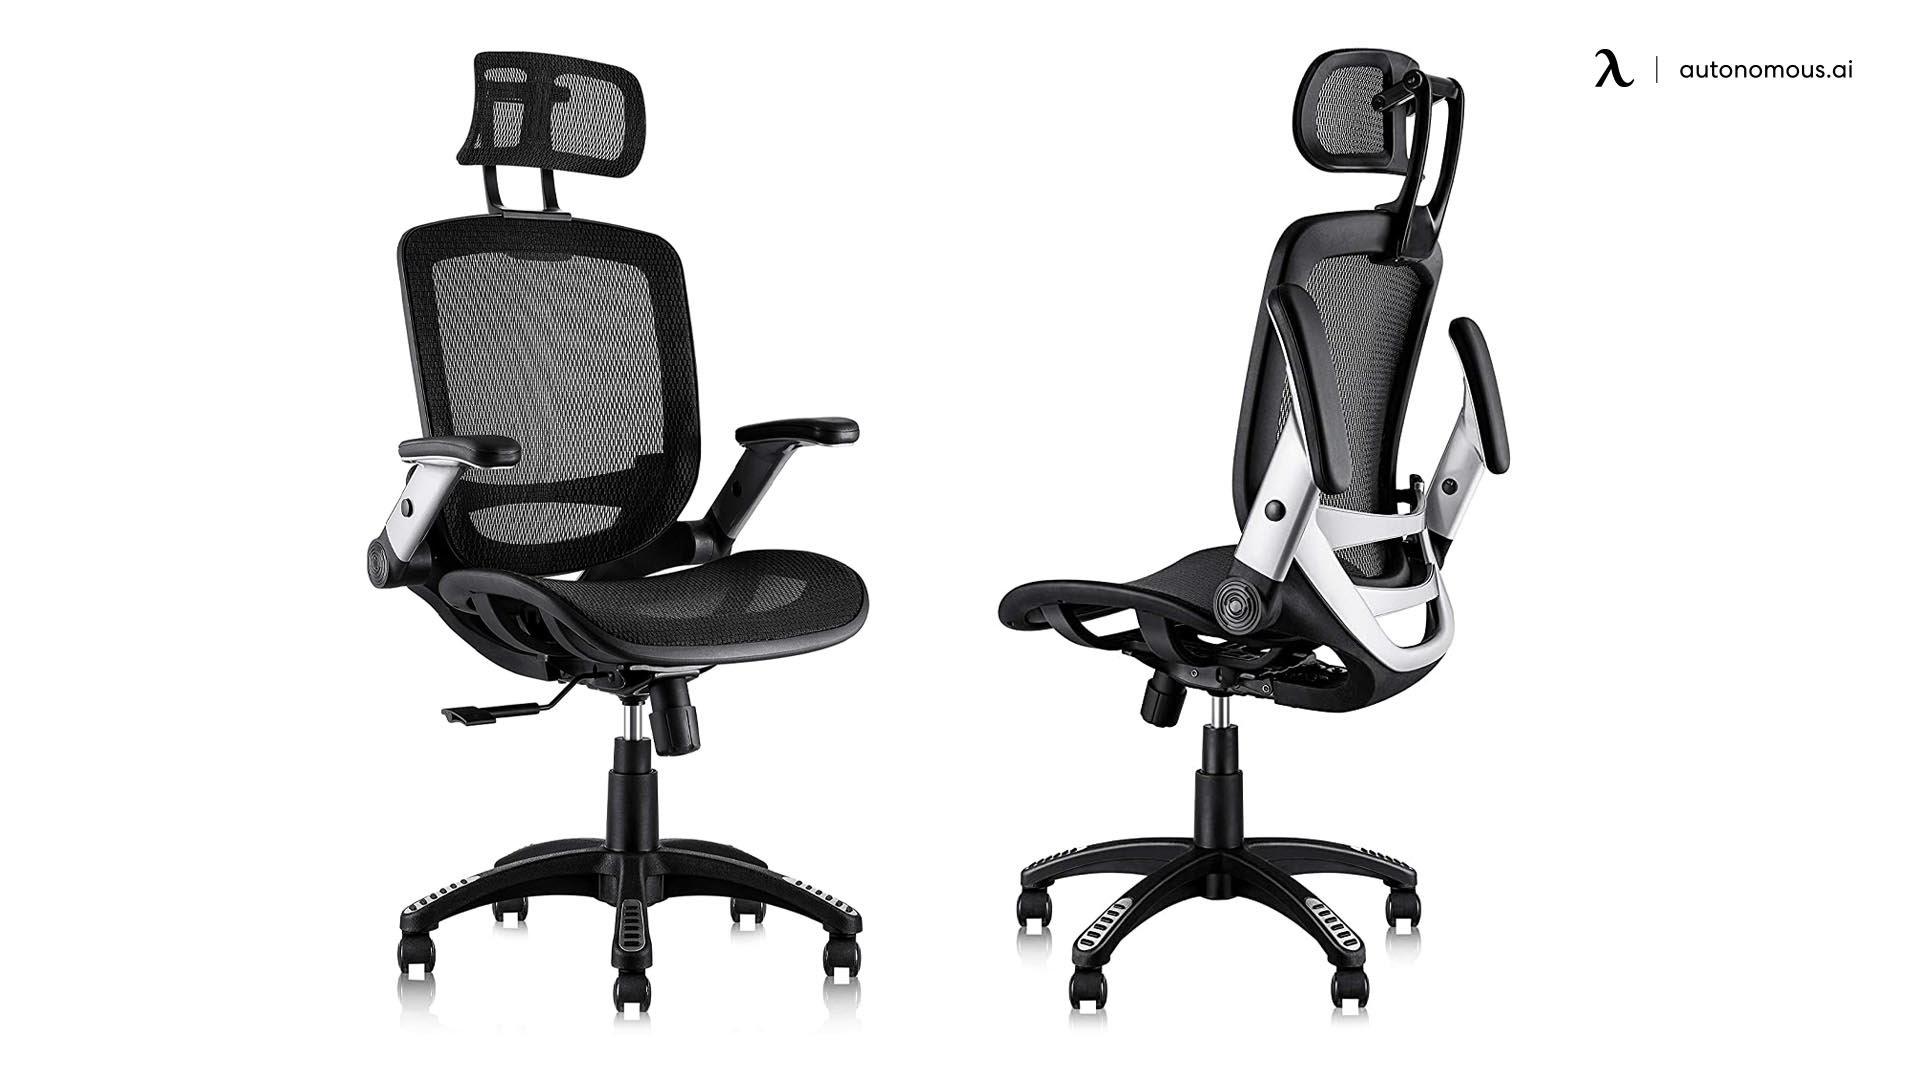 Ergonomic mesh office chair by Gabrylly